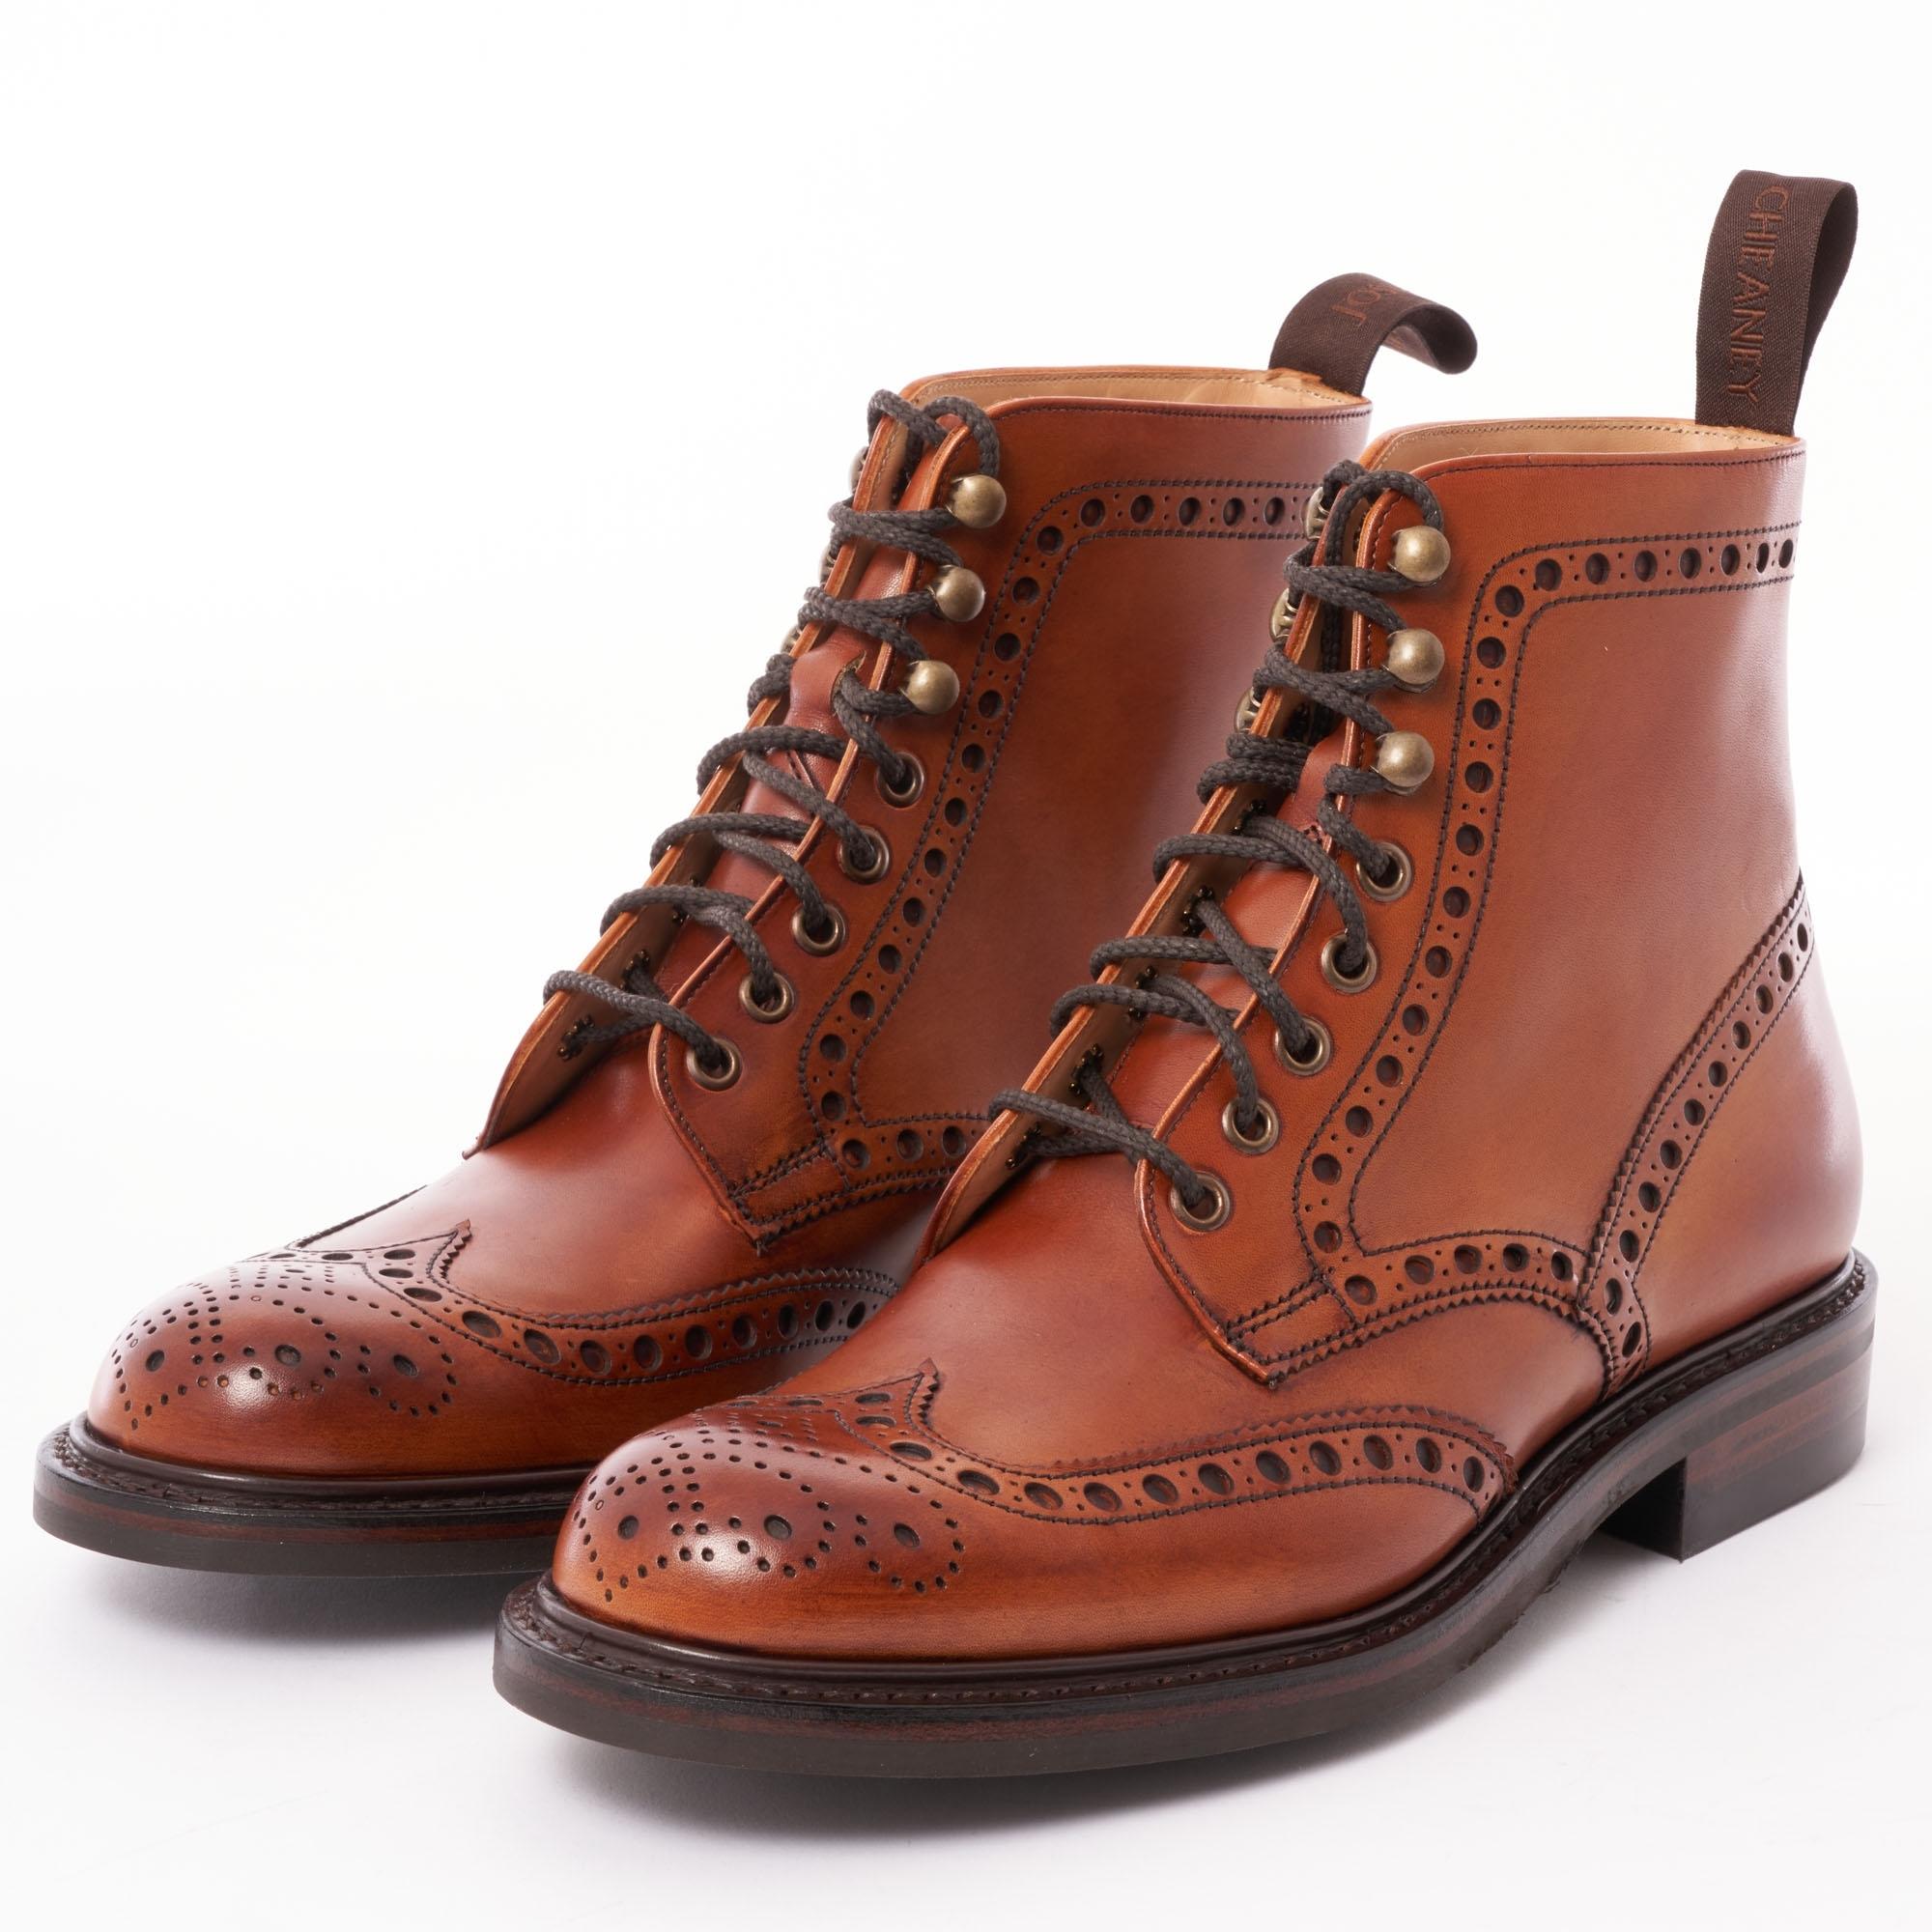 b3463b3525c Tweed Wingcap Brogue Boot - Dark Leaf Calf Leather